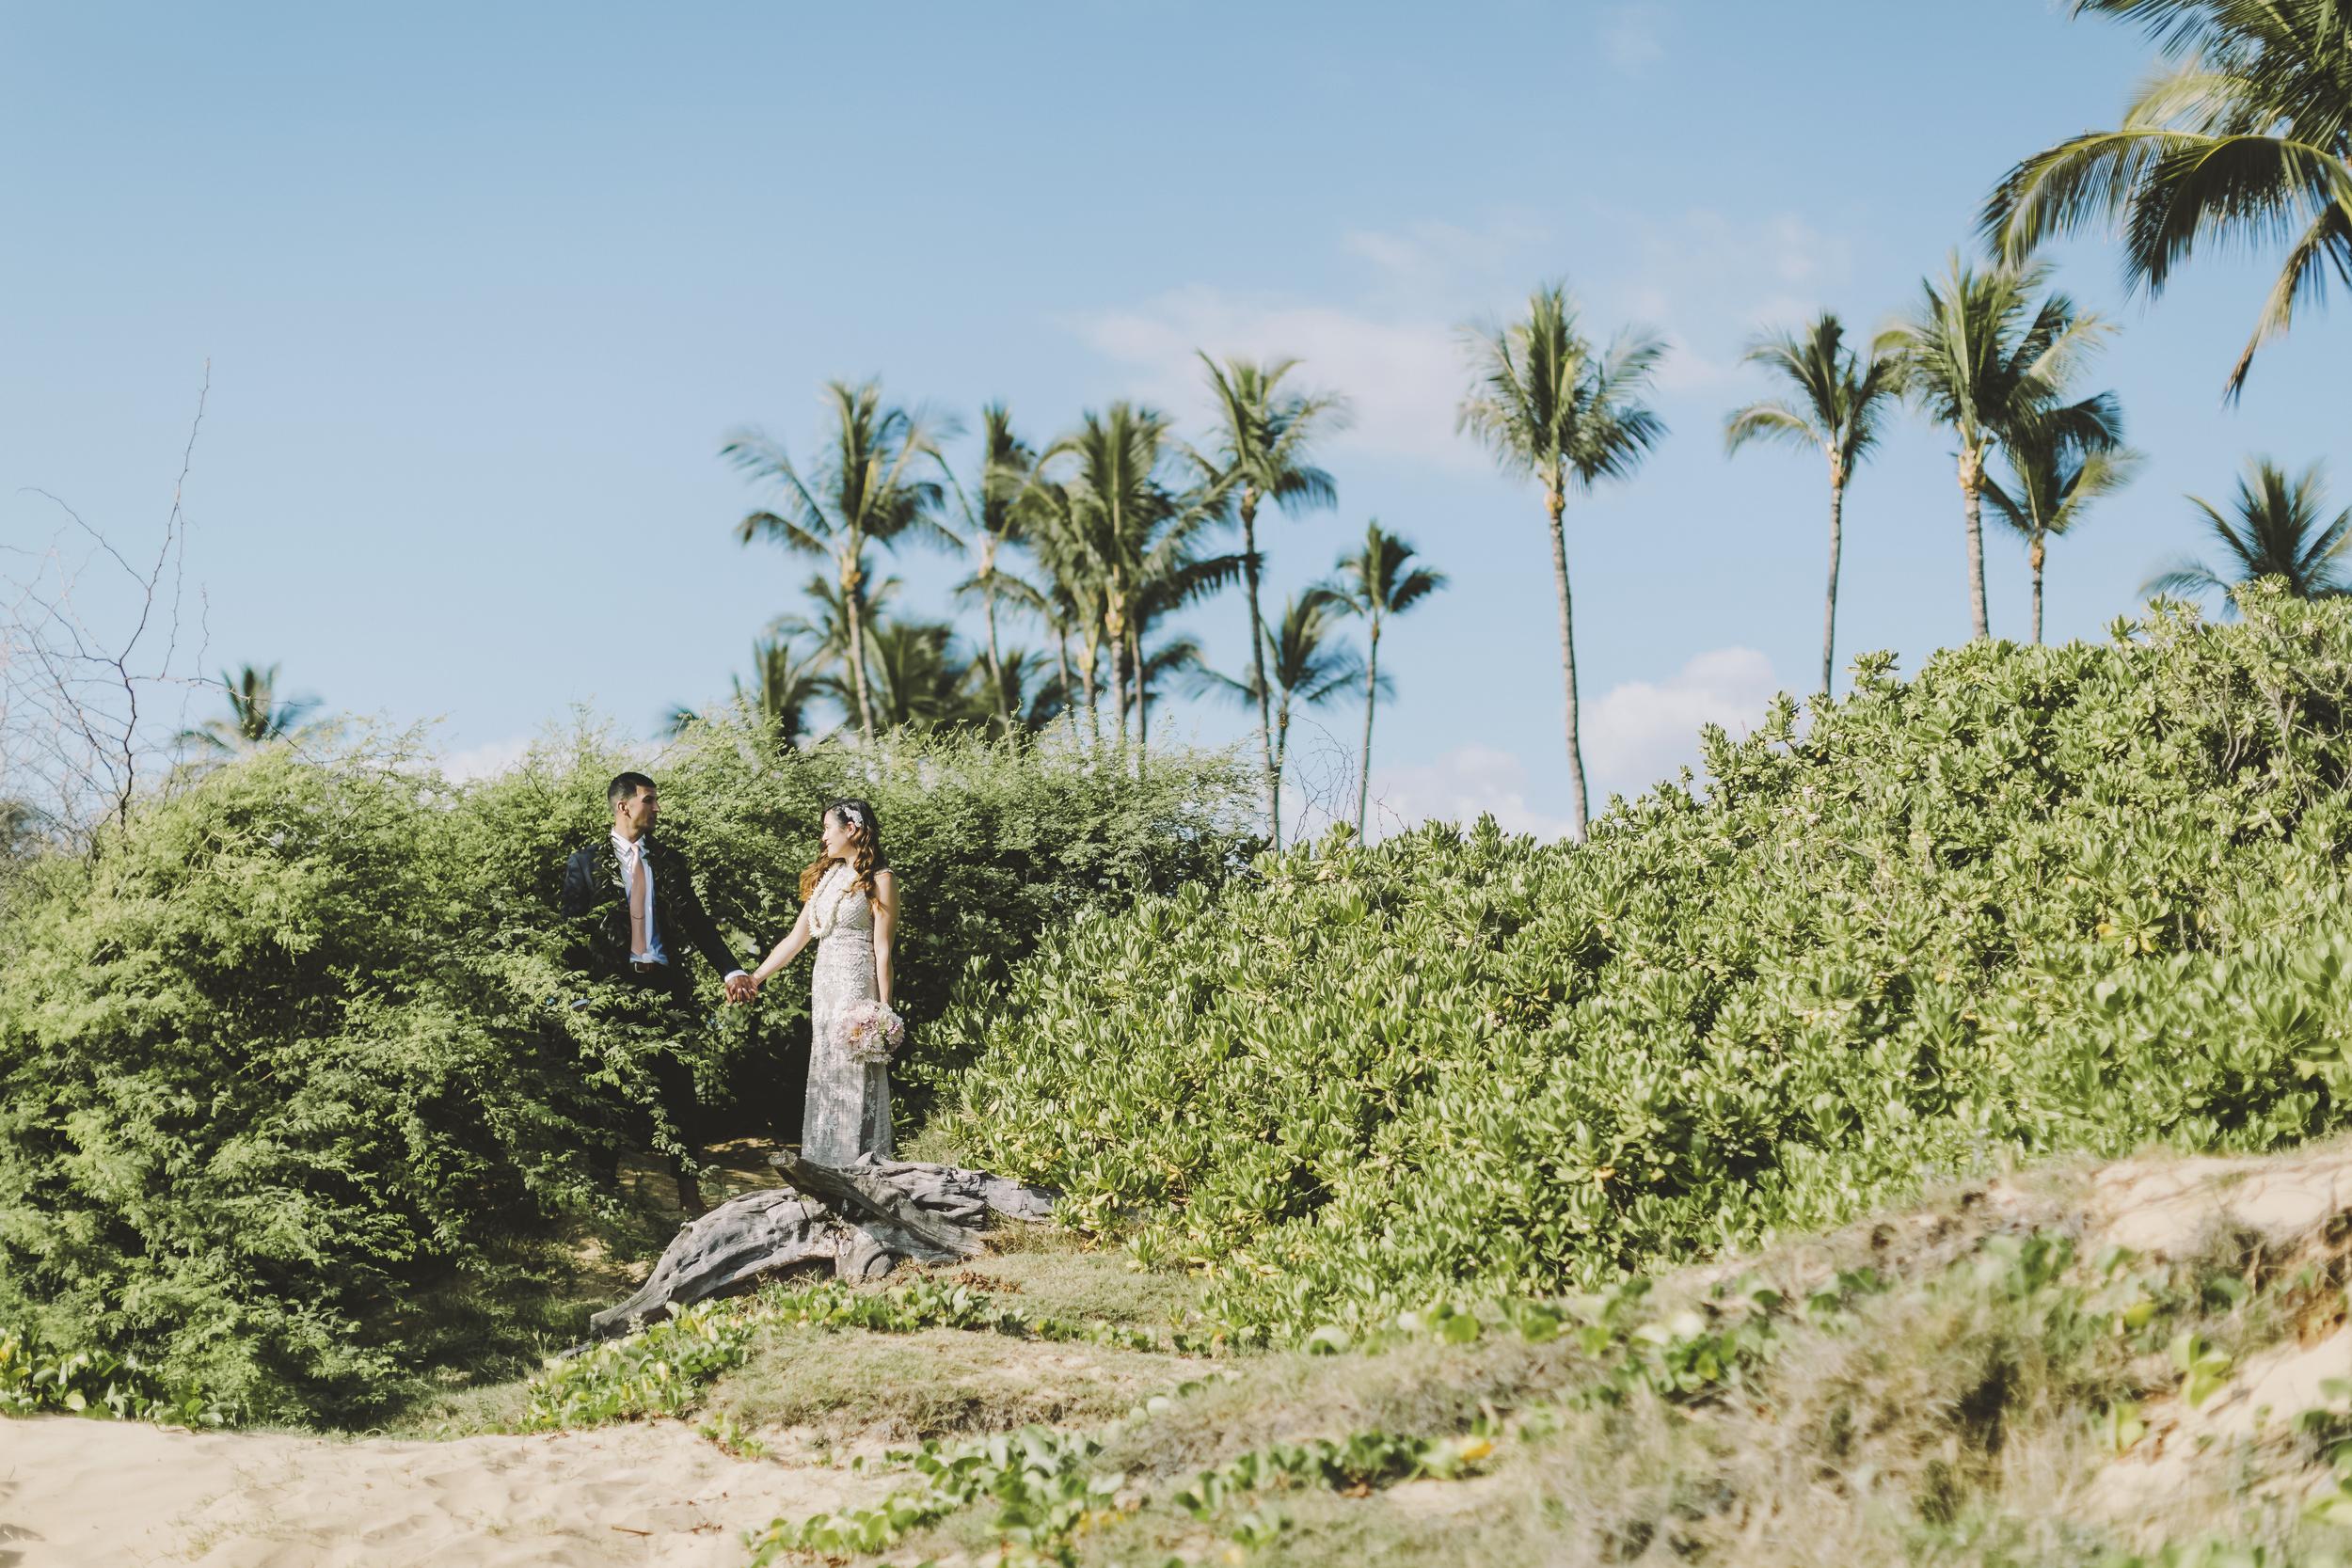 angie-diaz-photography-mokapu-beach-maui-elopement-52.jpg